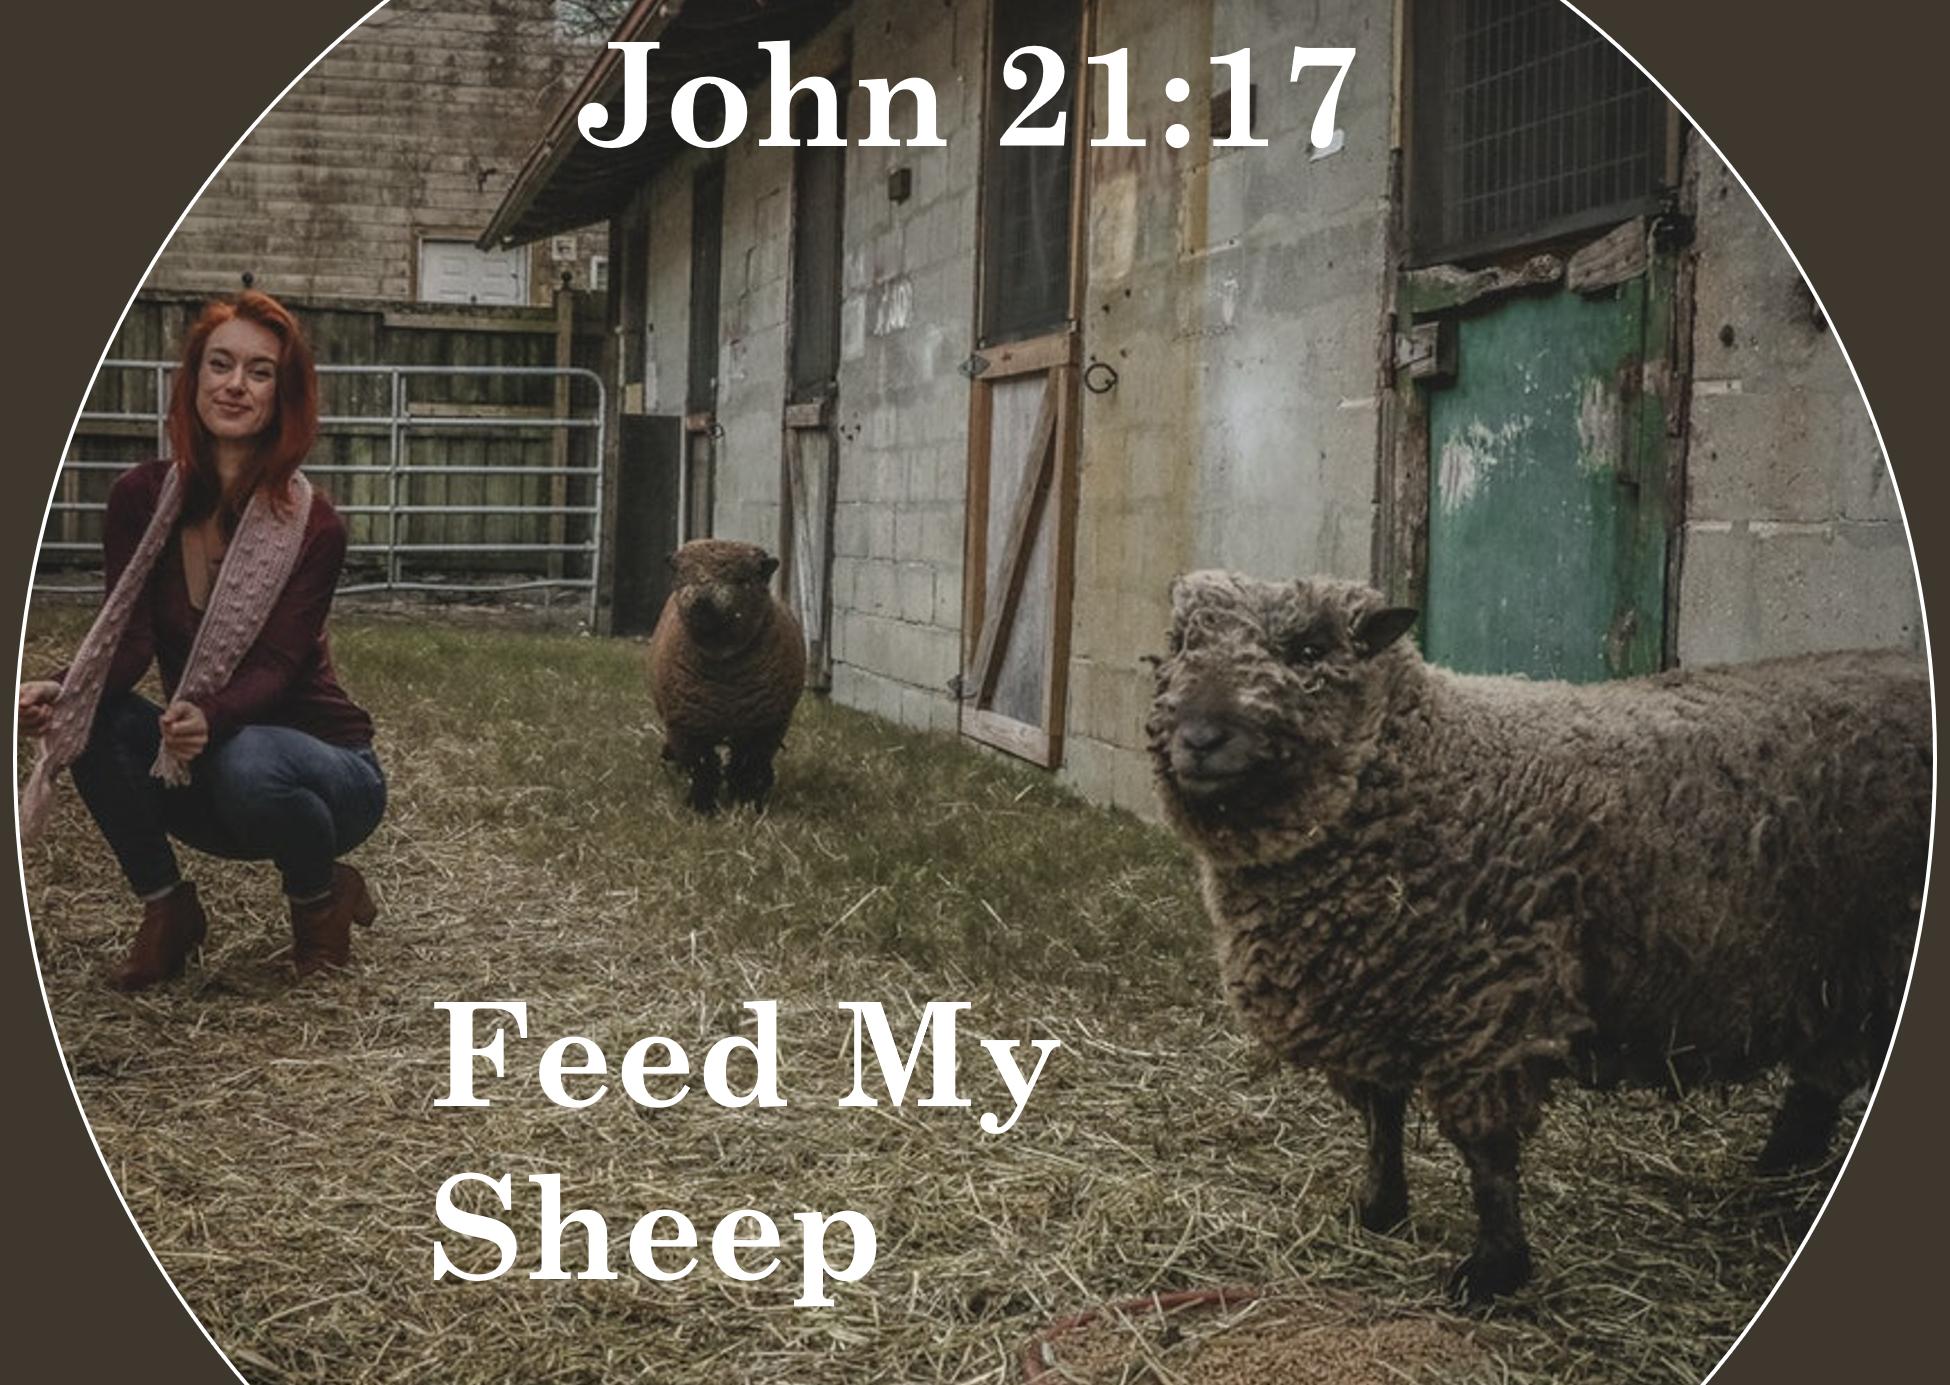 feed-my-sheep3.png